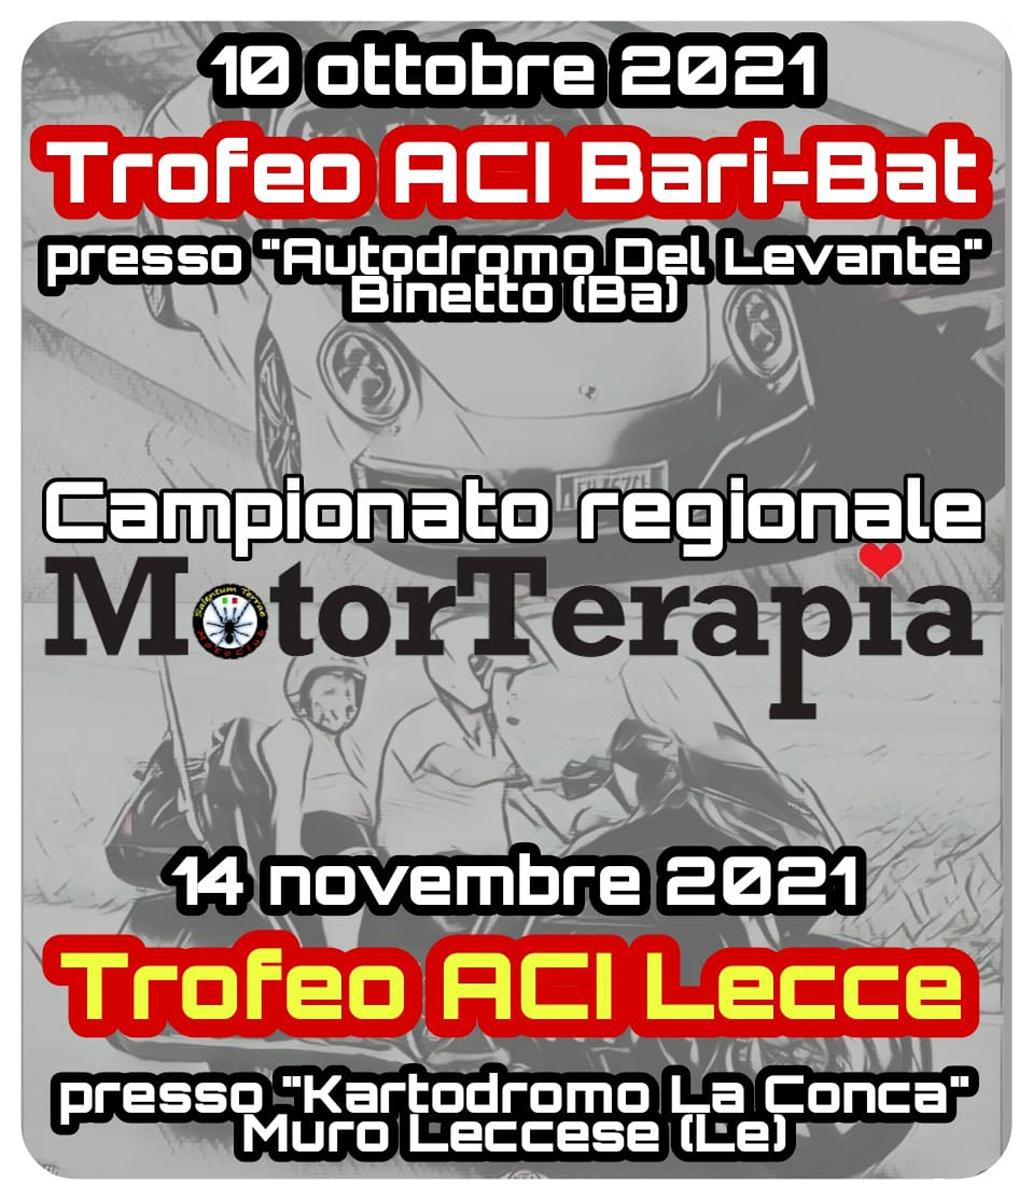 Locandina Seconda edizione di MotorTerapia Trofeo ACI Bari BAT MotoClub Salentum Terrae 2021